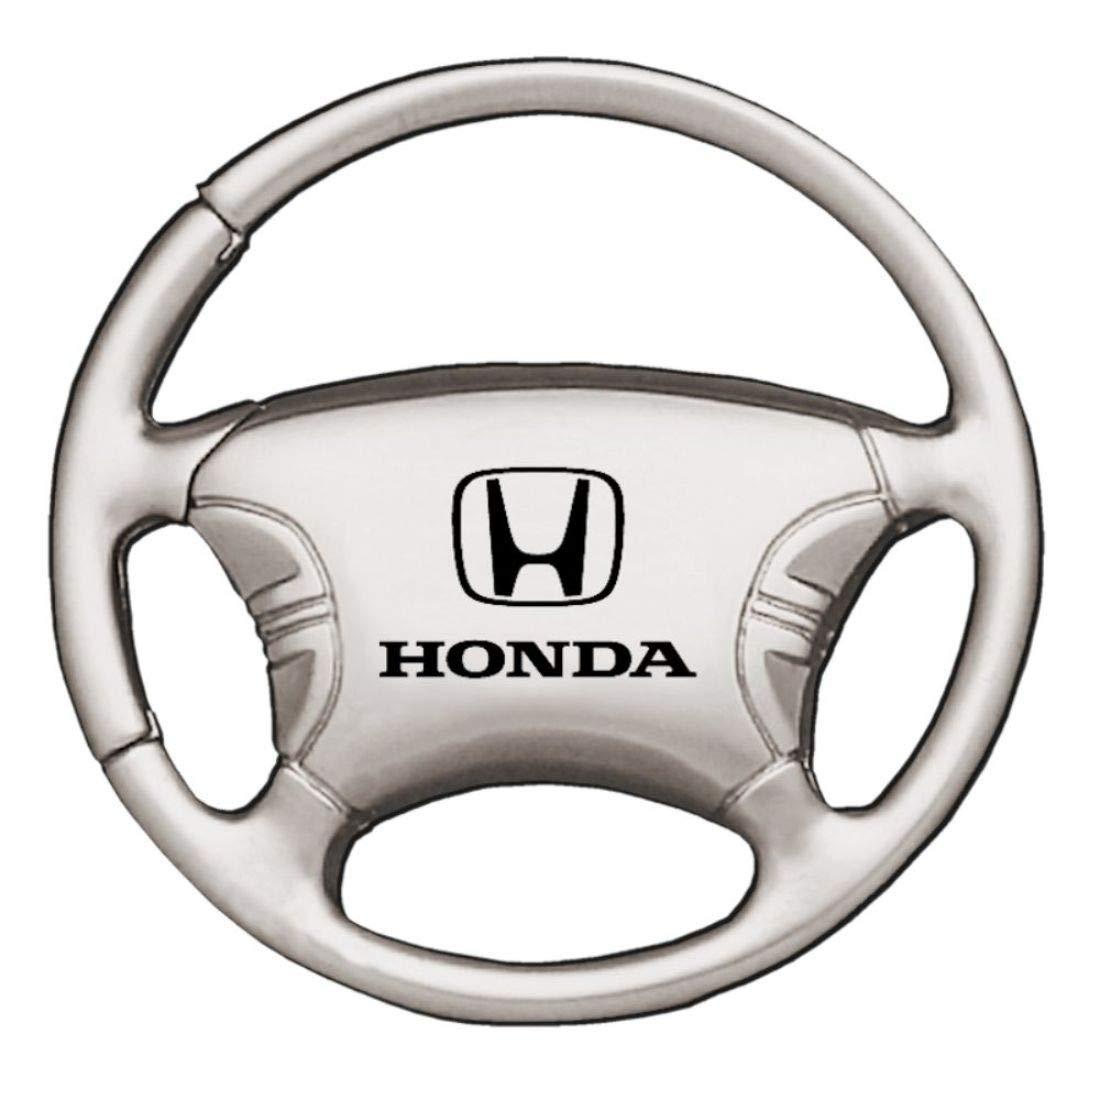 DanteGTS Honda Civic Accord Piloto Cromo Volante Llavero ...